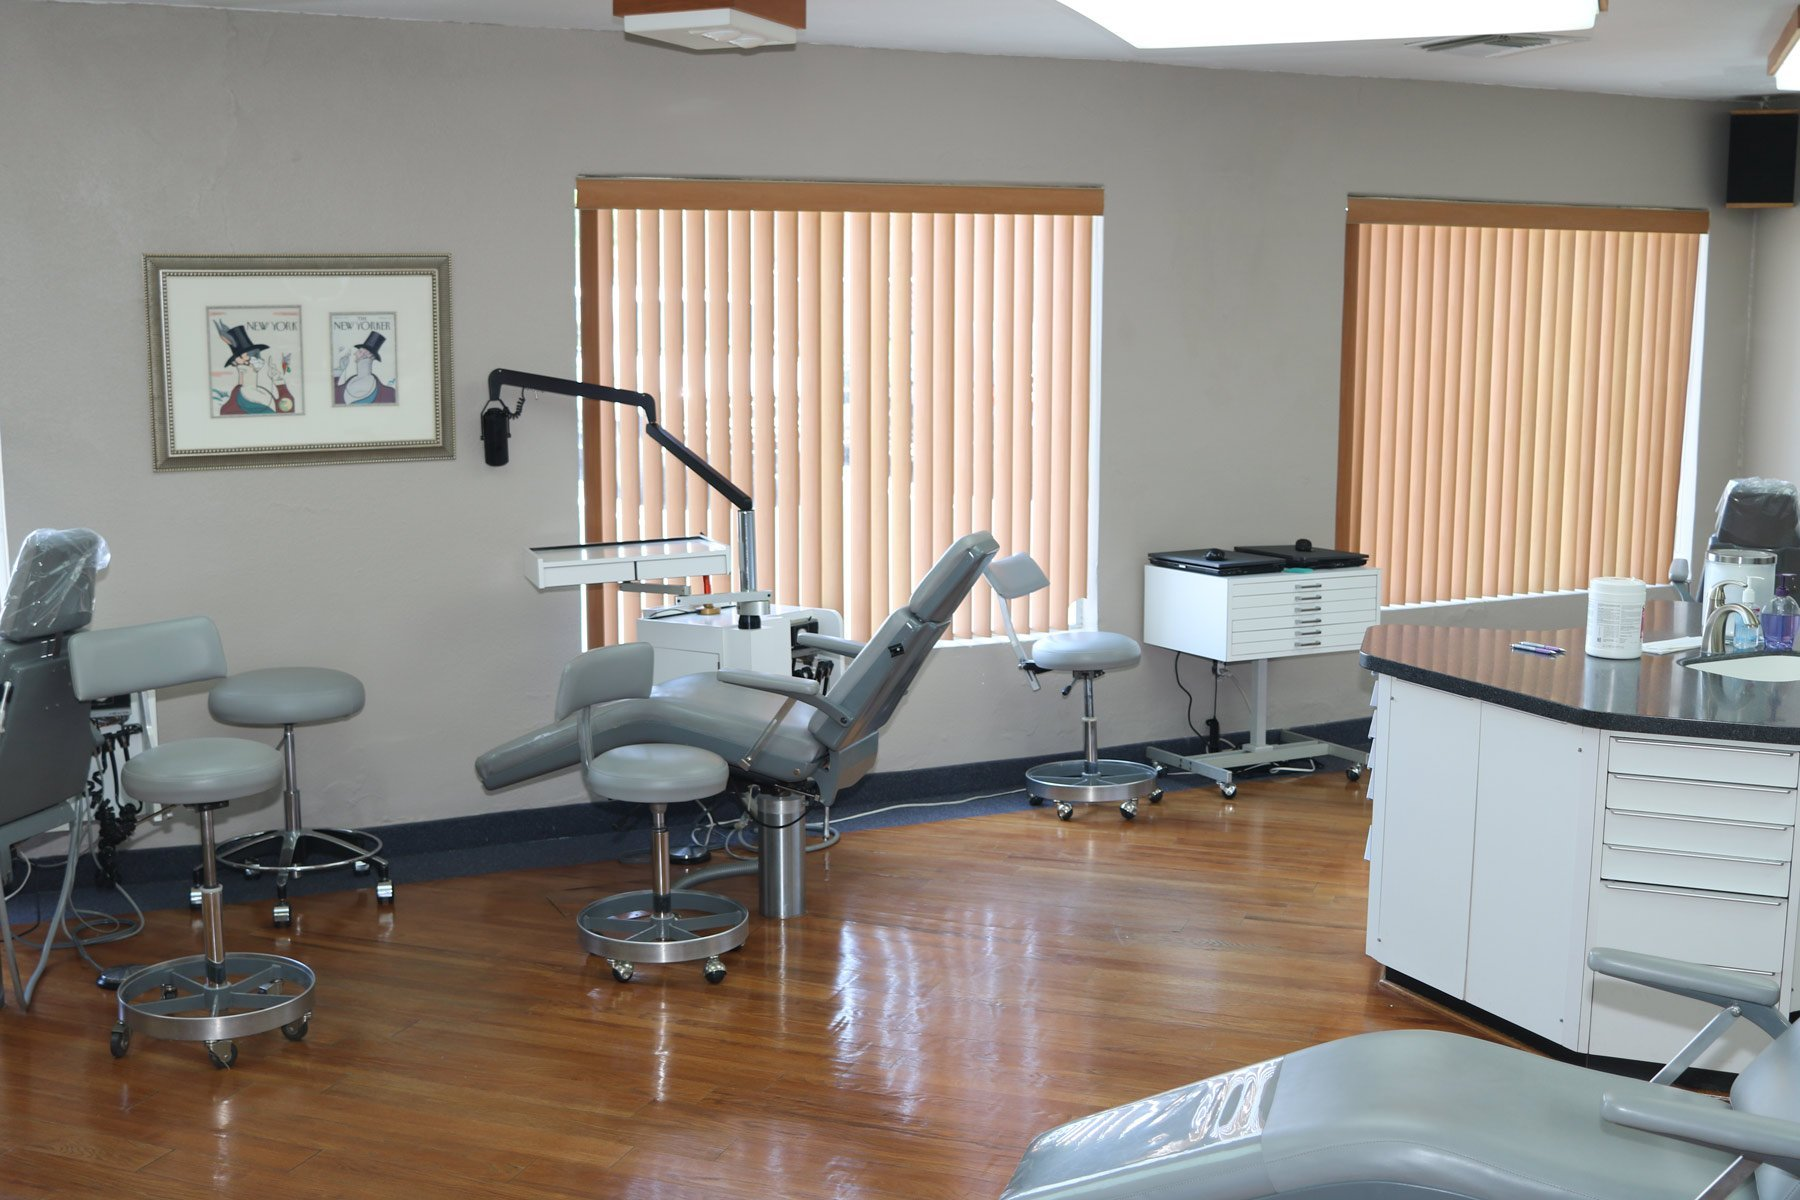 Glendale Orthodontics Location